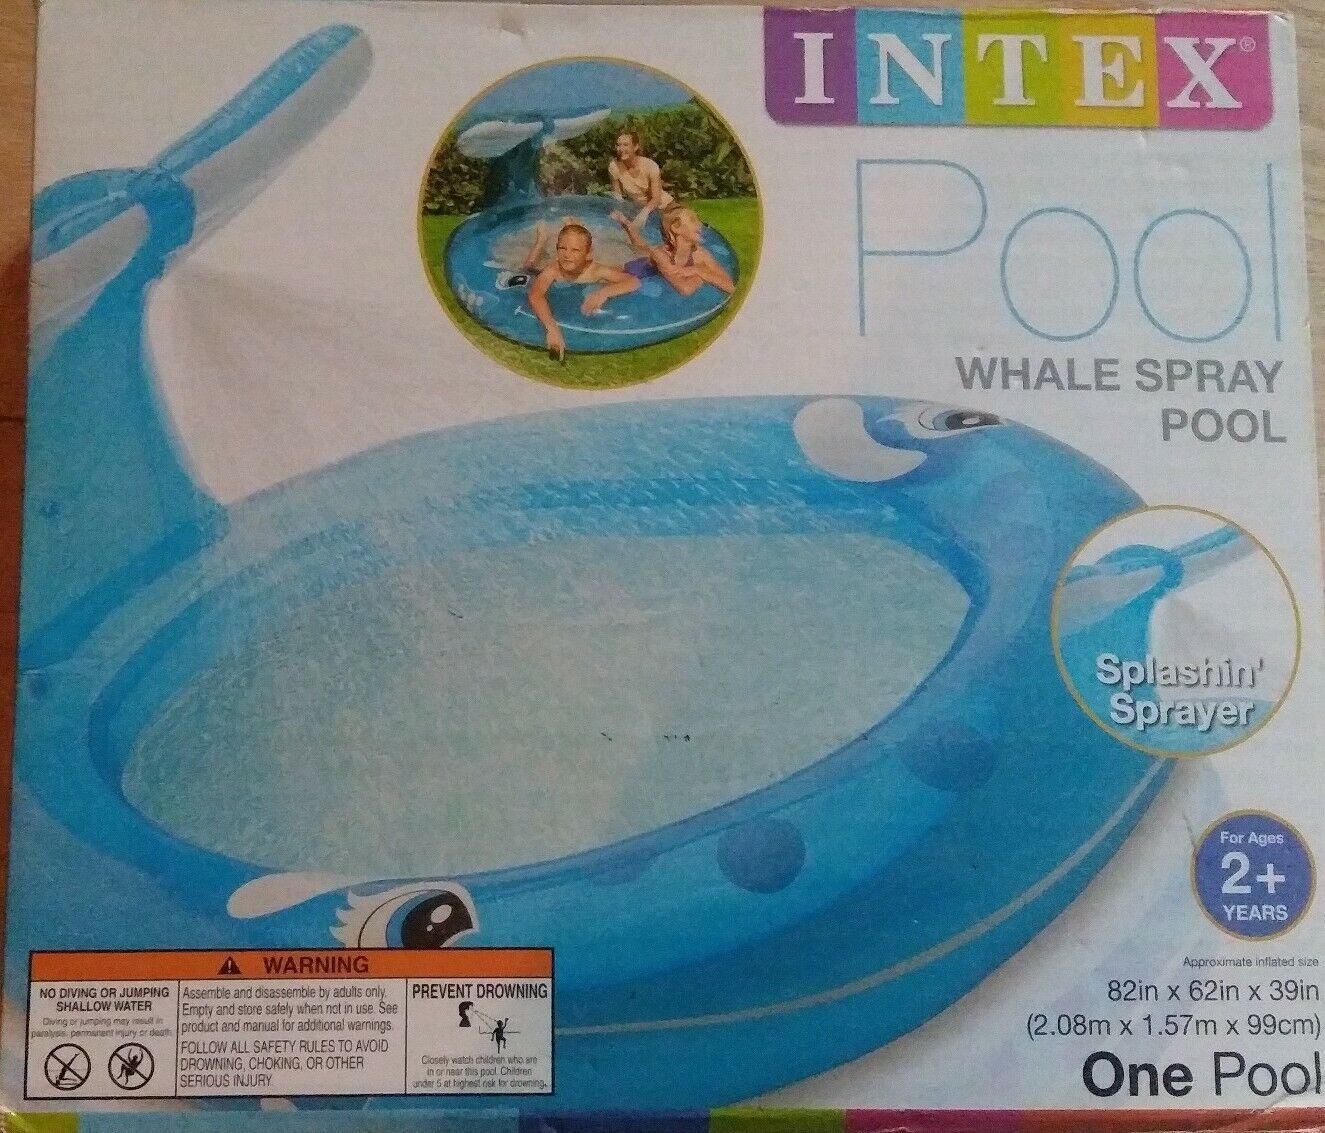 INTEX RECREATION Whale Spray Pool 82in x 62in x 39in (2.08m x 1.57m x 99cm) 2+